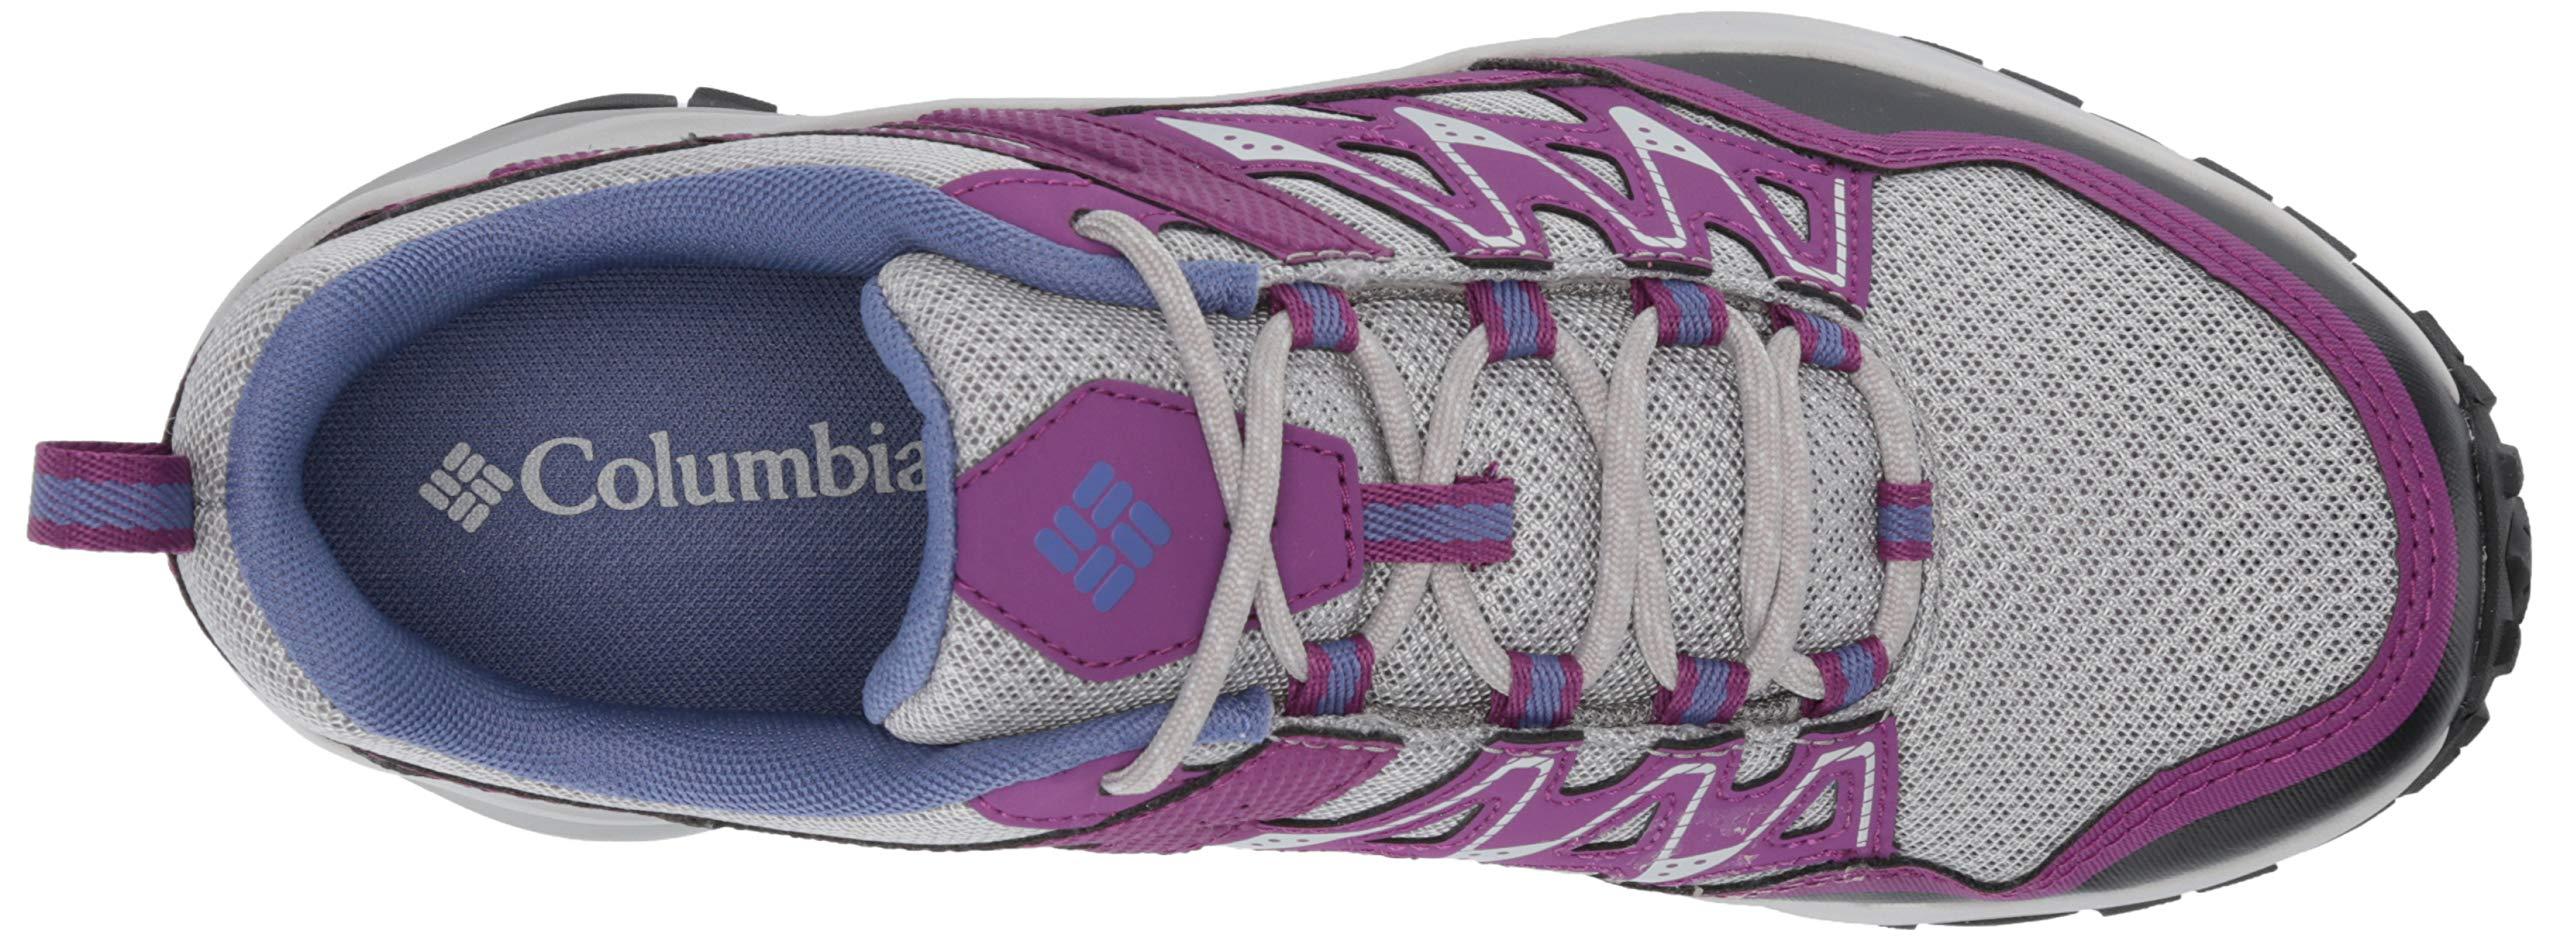 81rzrJL5uHL - Columbia Women's WAYFINDER Hiking Shoes